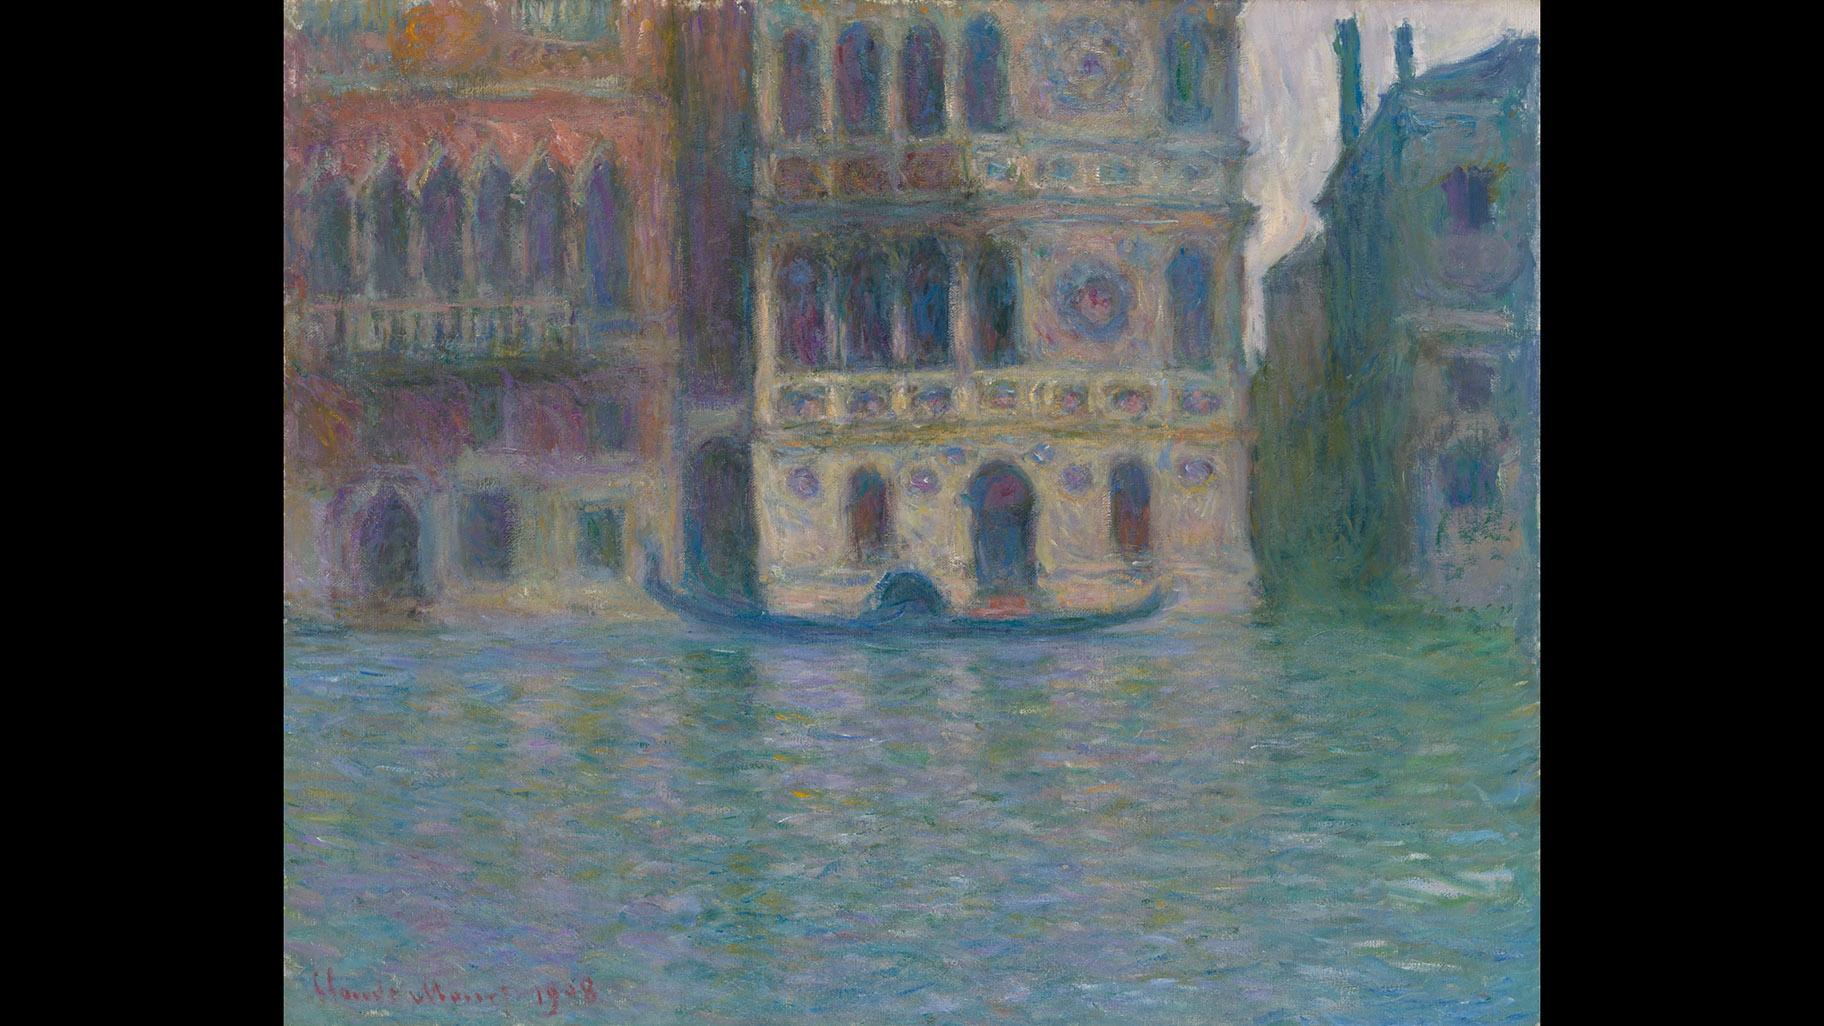 Claude Monet. Venice, Palazzo Dario, 1908. The Art Institute of Chicago, Mr. and Mrs. Lewis Larned Coburn Memorial Collection.